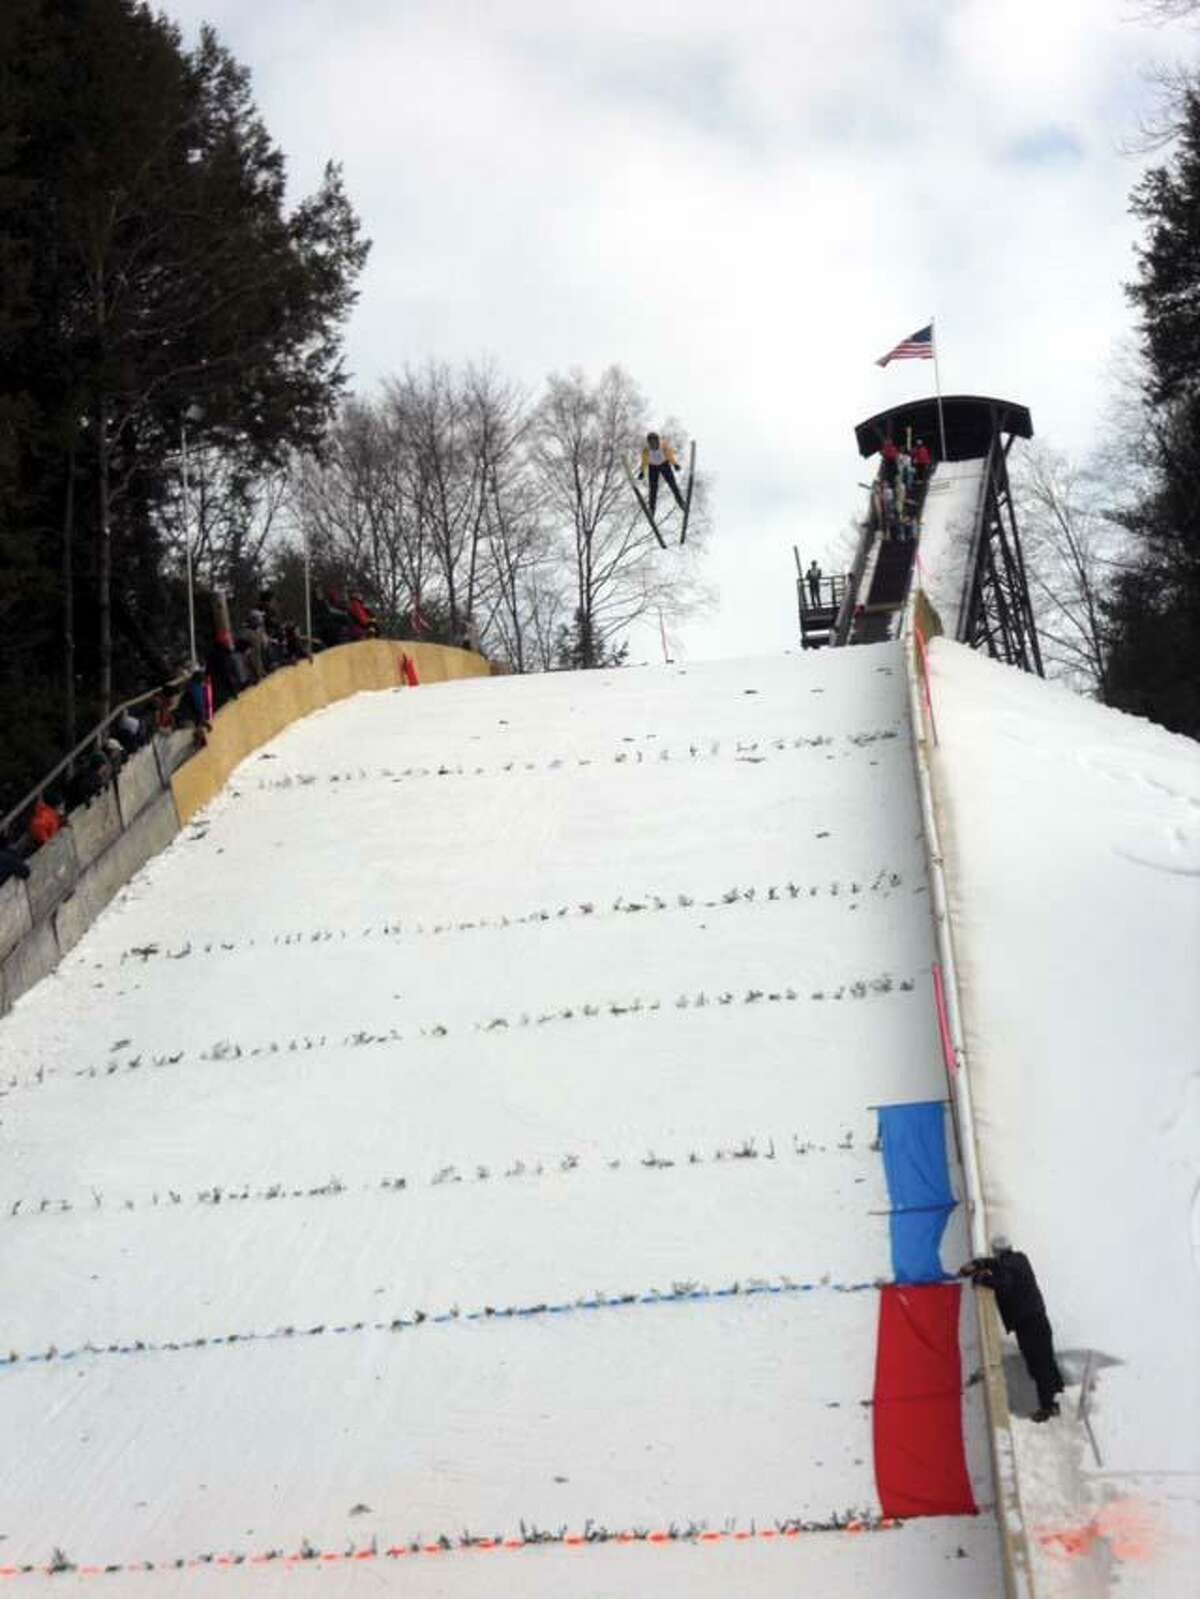 CHRIS RUELI/ Register CitizenA ski jumper soars thrugh the air before landing 70 meters from the take-off